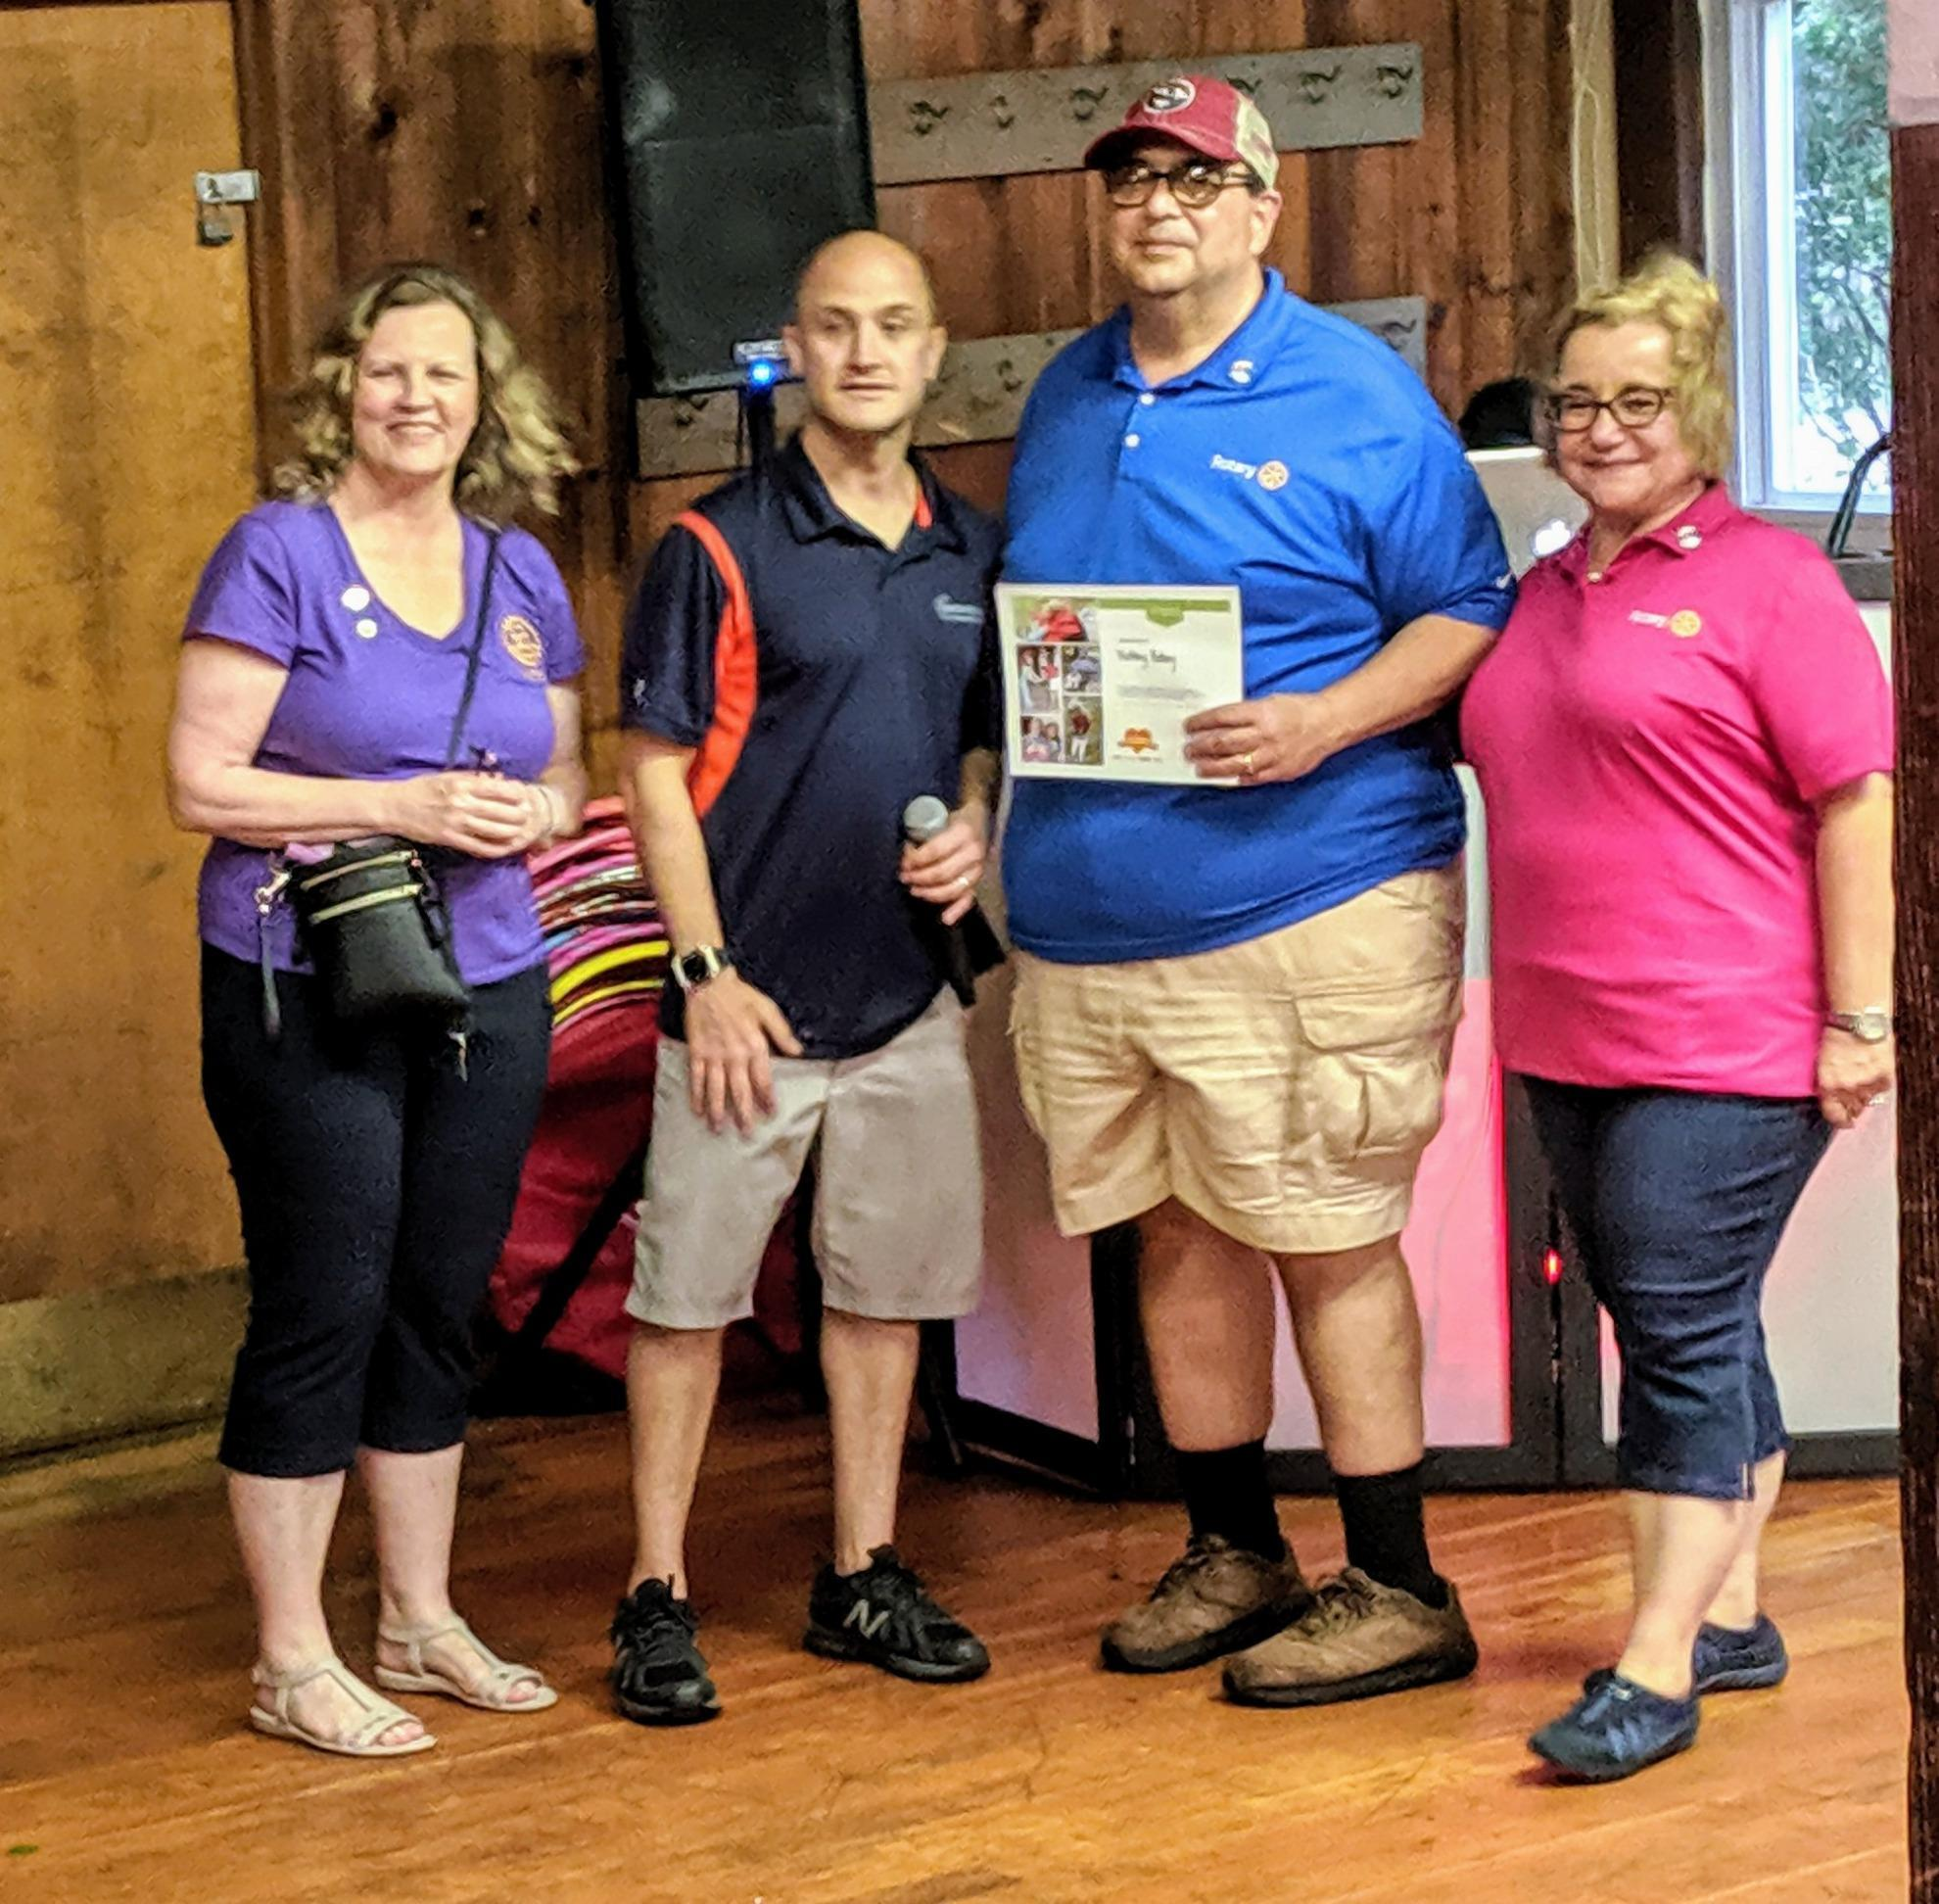 Merry Heart Camp Awards: President Ben Costa, immediate past President Ro Costa, President Elect Dorothy Huey and Camp Director Dave